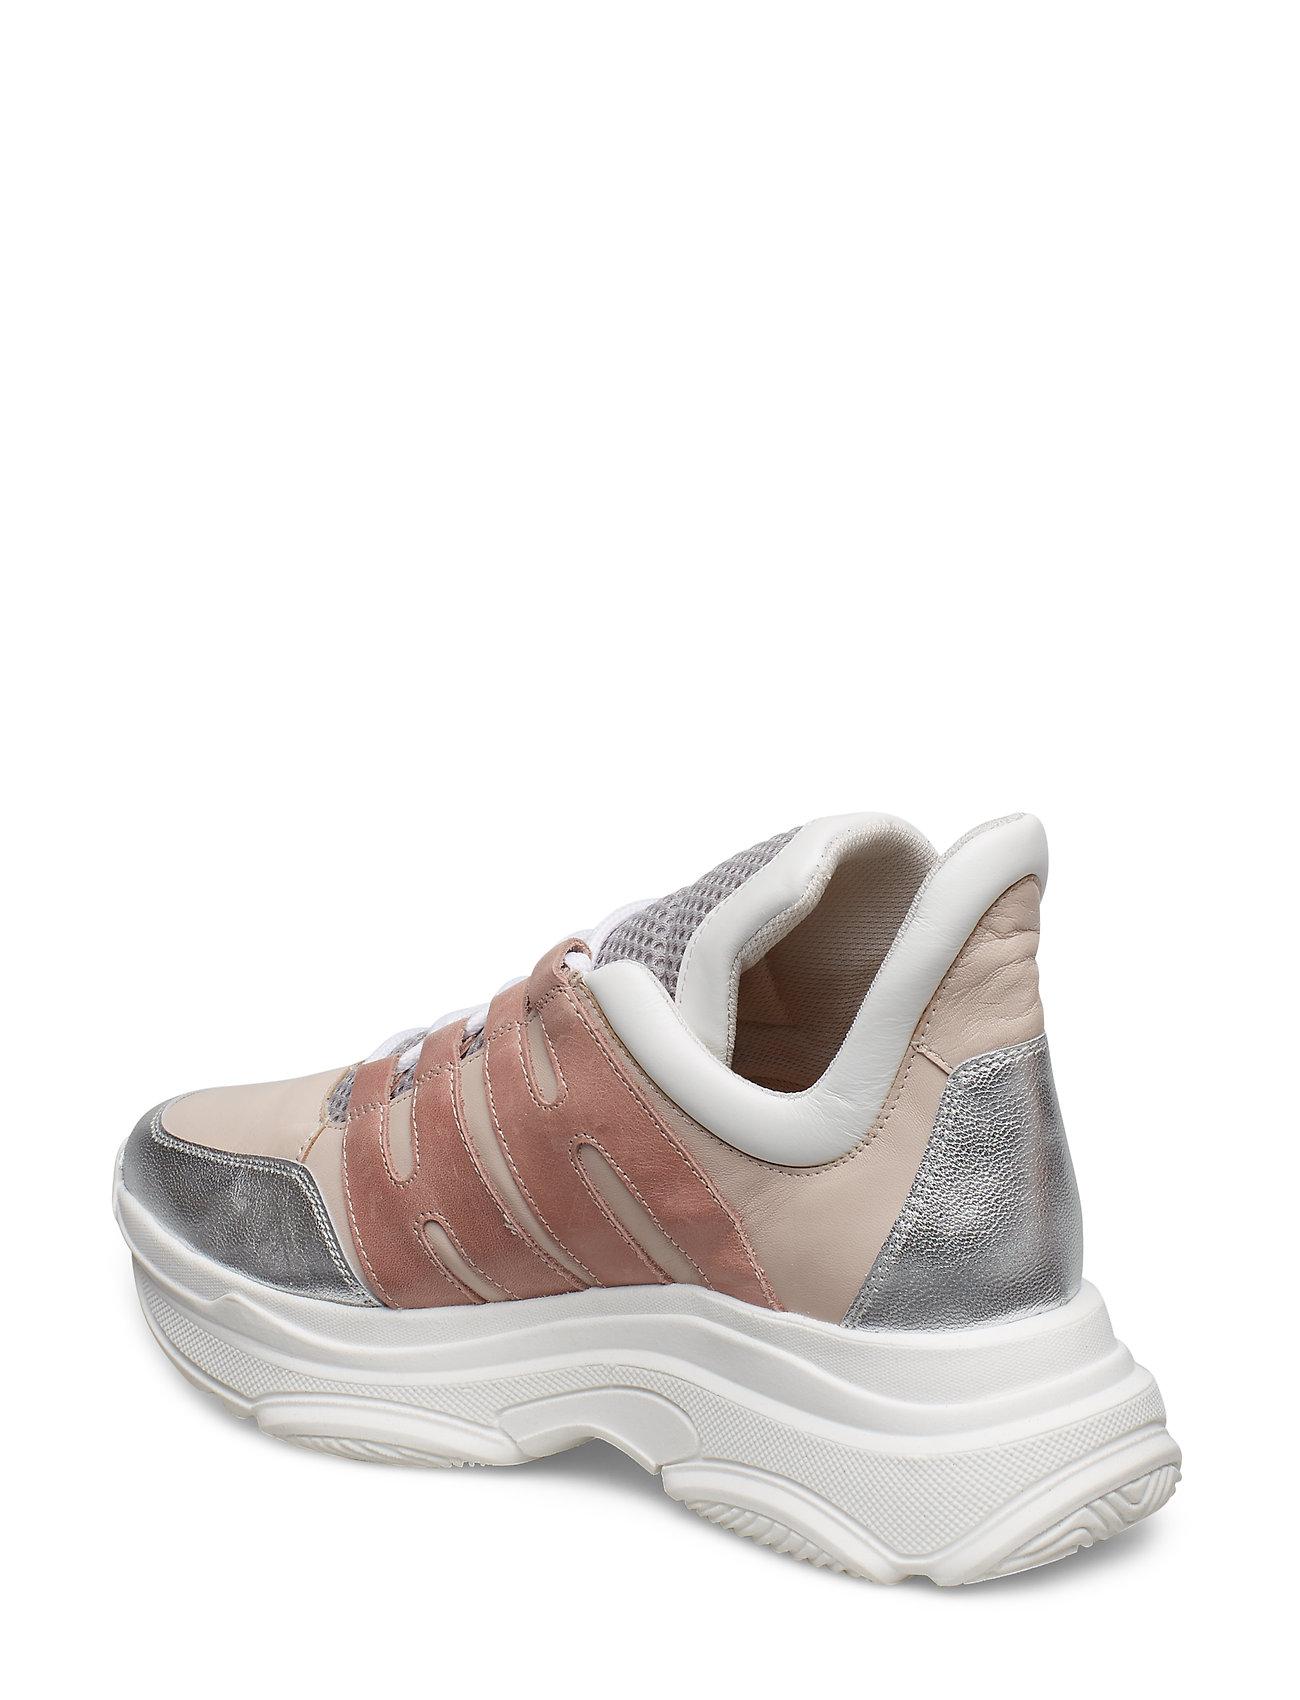 Henry Kole Silvana - Sneaker BLUSH - Schuhe Billige